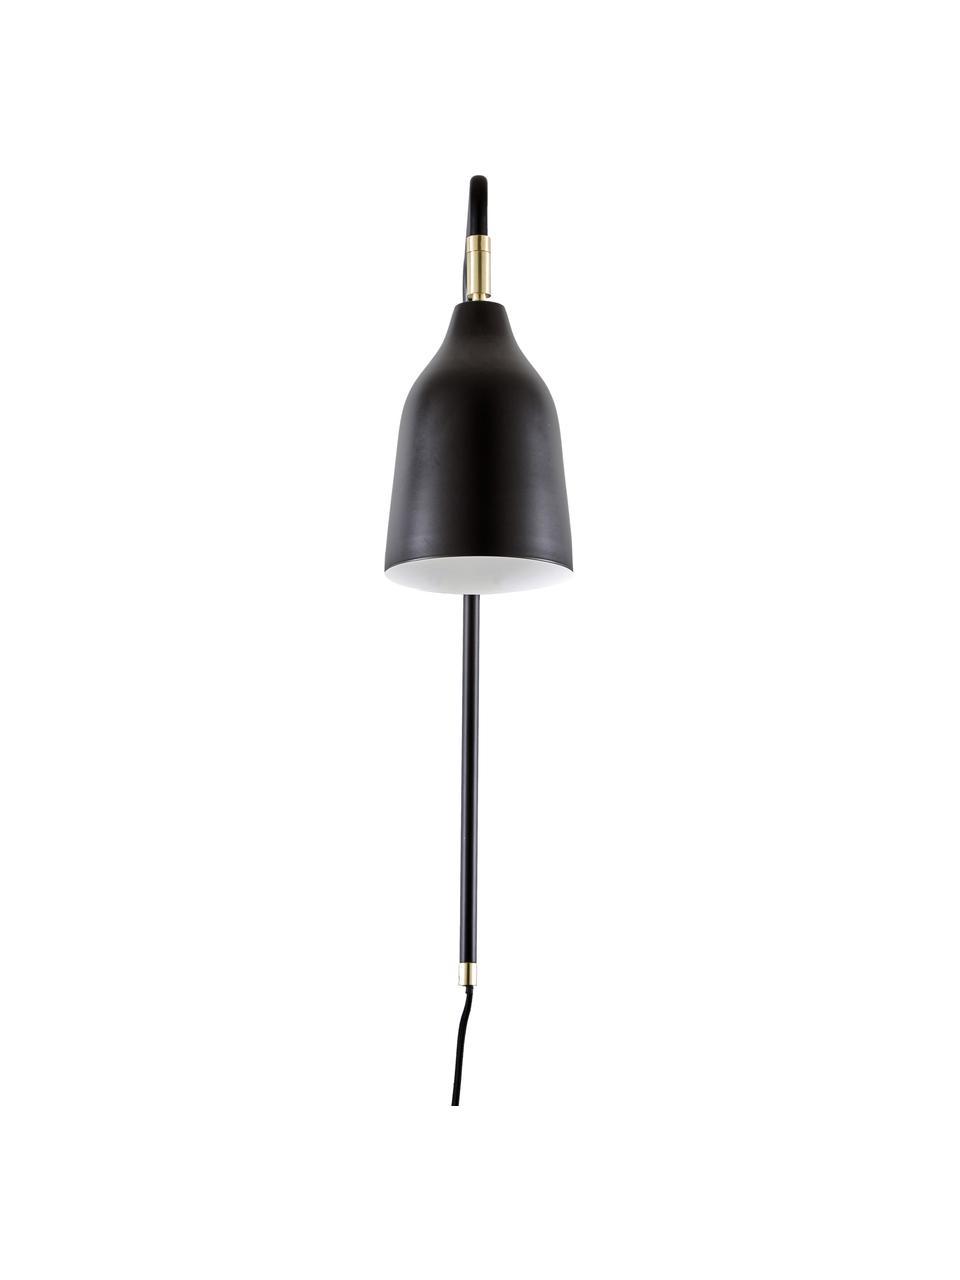 Wandlamp Mora met stekker, Lampenkap: gepoedercoat metaal, Frame: gepoedercoat metaal, Decoratie: vermessingd metaal, Zwart, goudkleurig, 12 x 50 cm